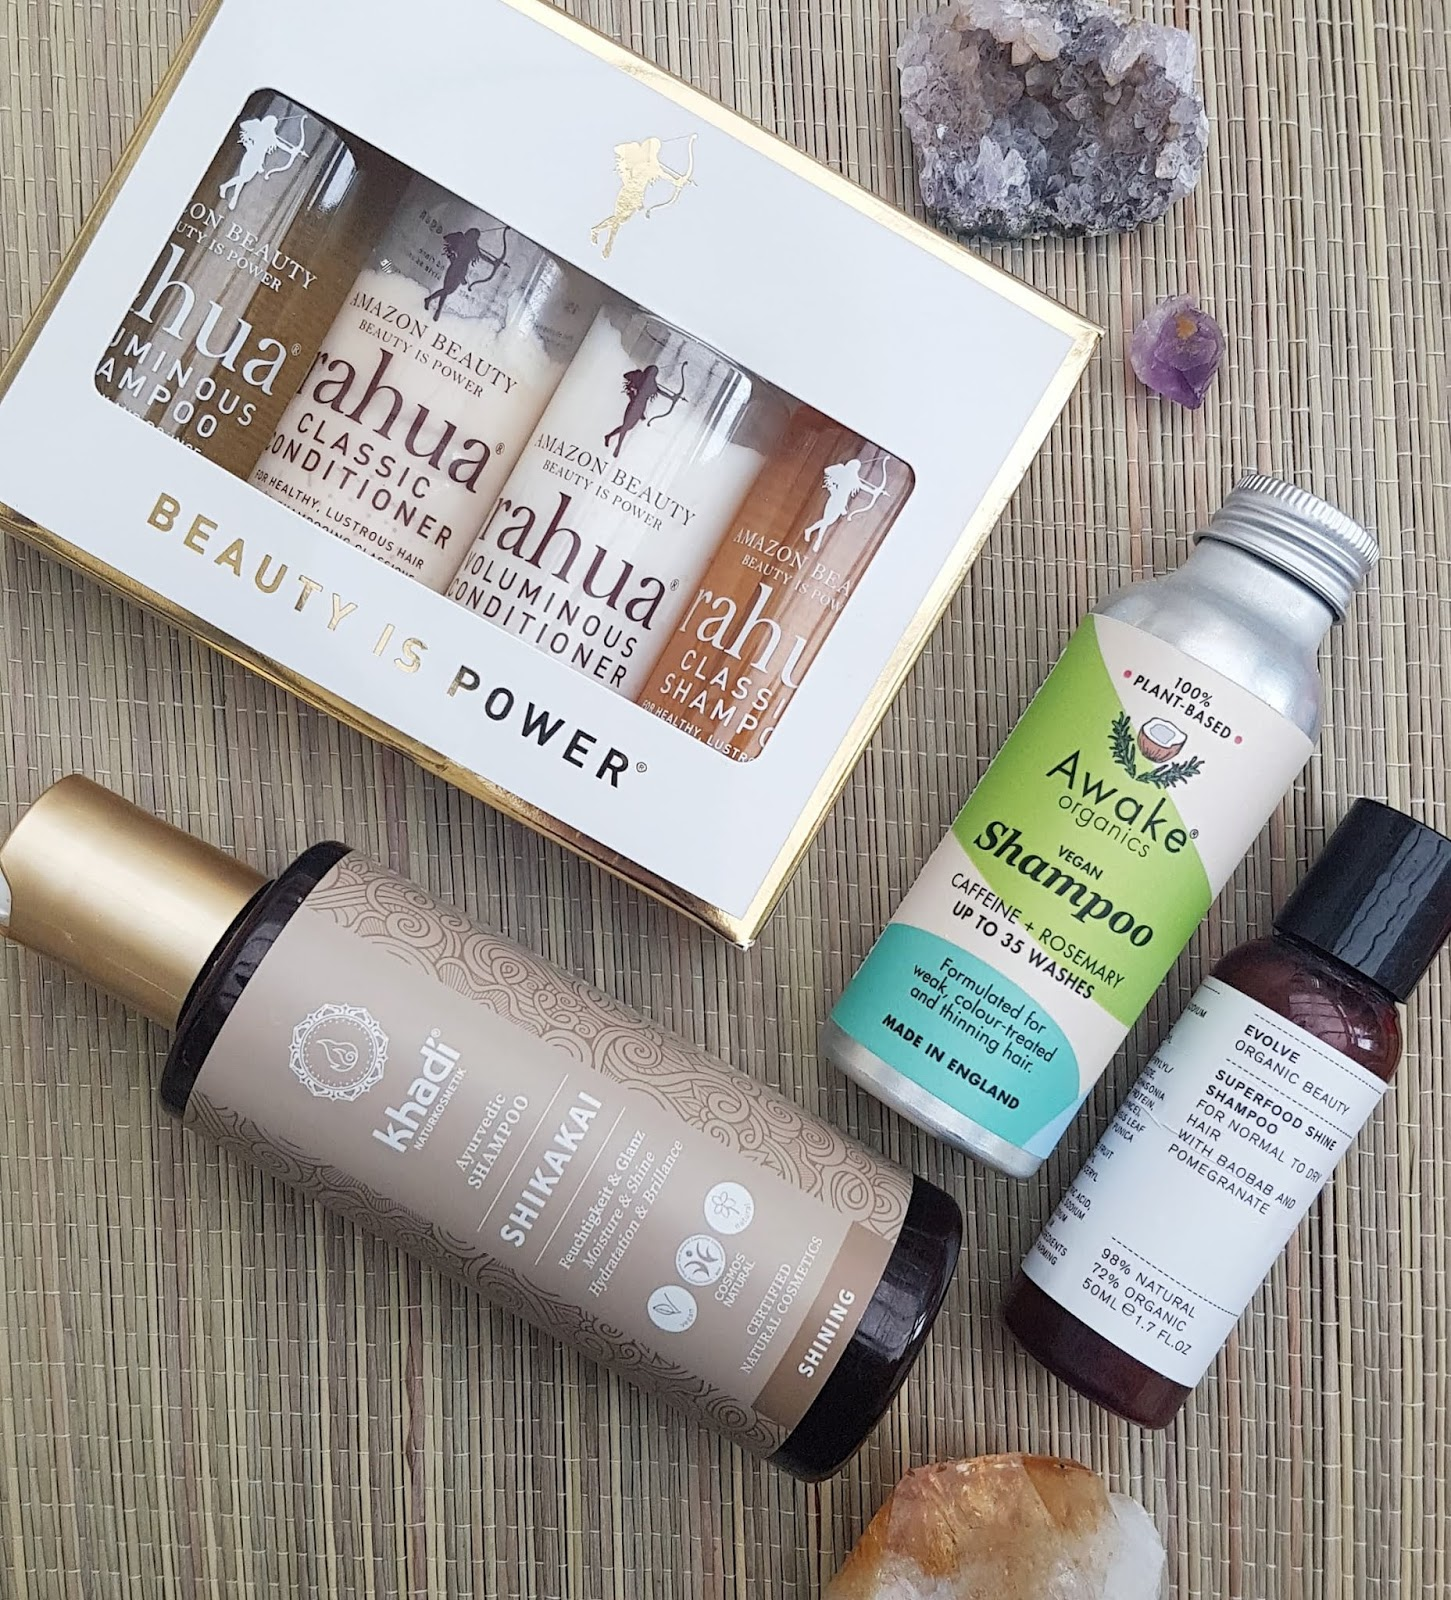 Hair Loss shampoo conditioner - Natural Hair Loss Recovery Review